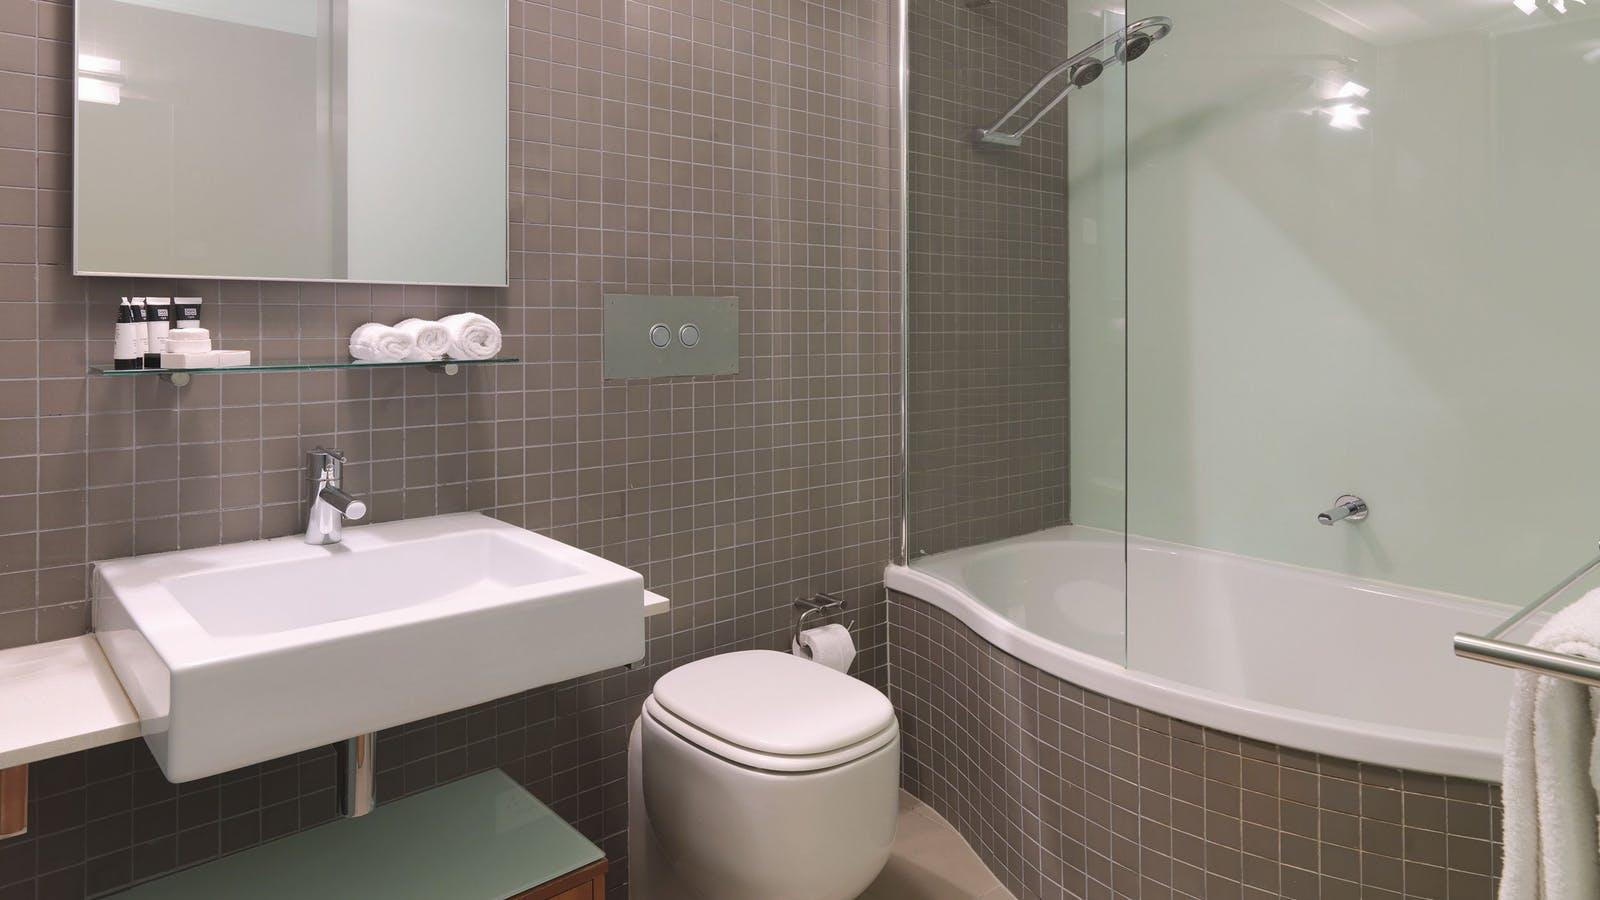 Adina Apartment Hotel St Kilda - Bathroom